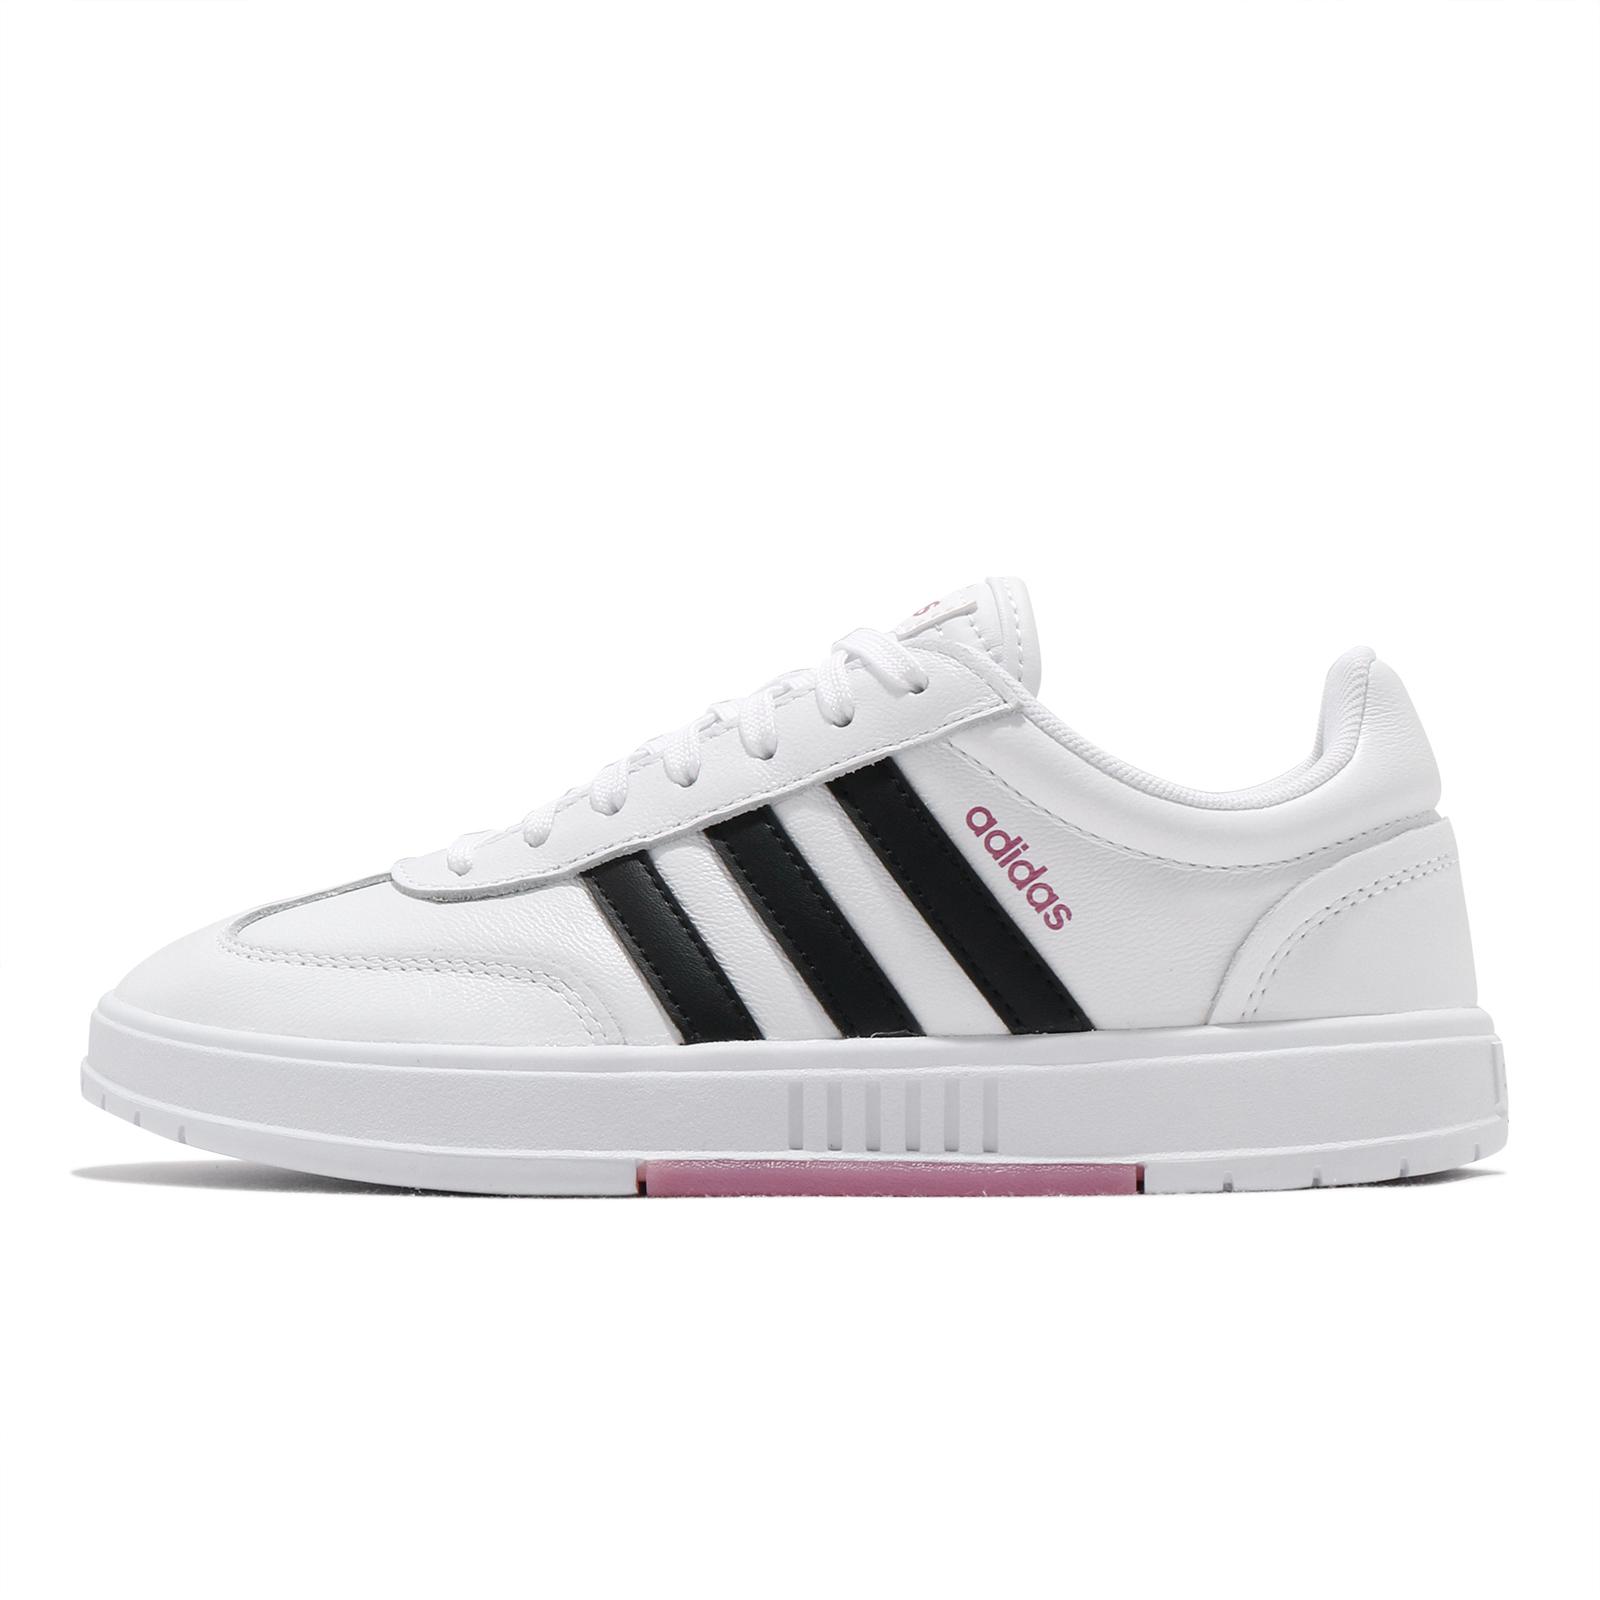 adidas 休閒鞋 Gradas 白 黑 粉紅 女鞋 愛迪達 Neo 小白鞋 百搭款 【ACS】 FW9366